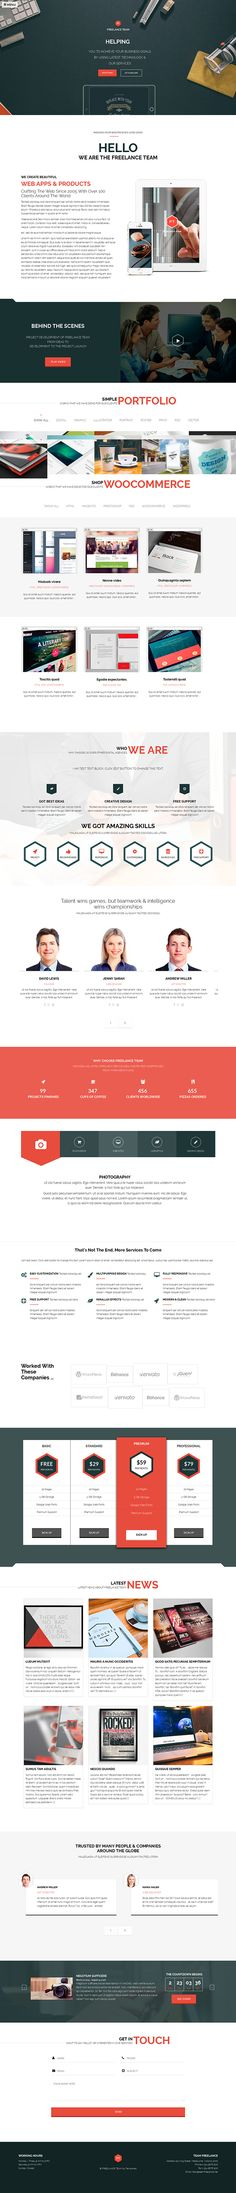 https://www.behance.net/gallery/24756961/Freelance-Team-Portfolio-Shop-WordPress-Theme